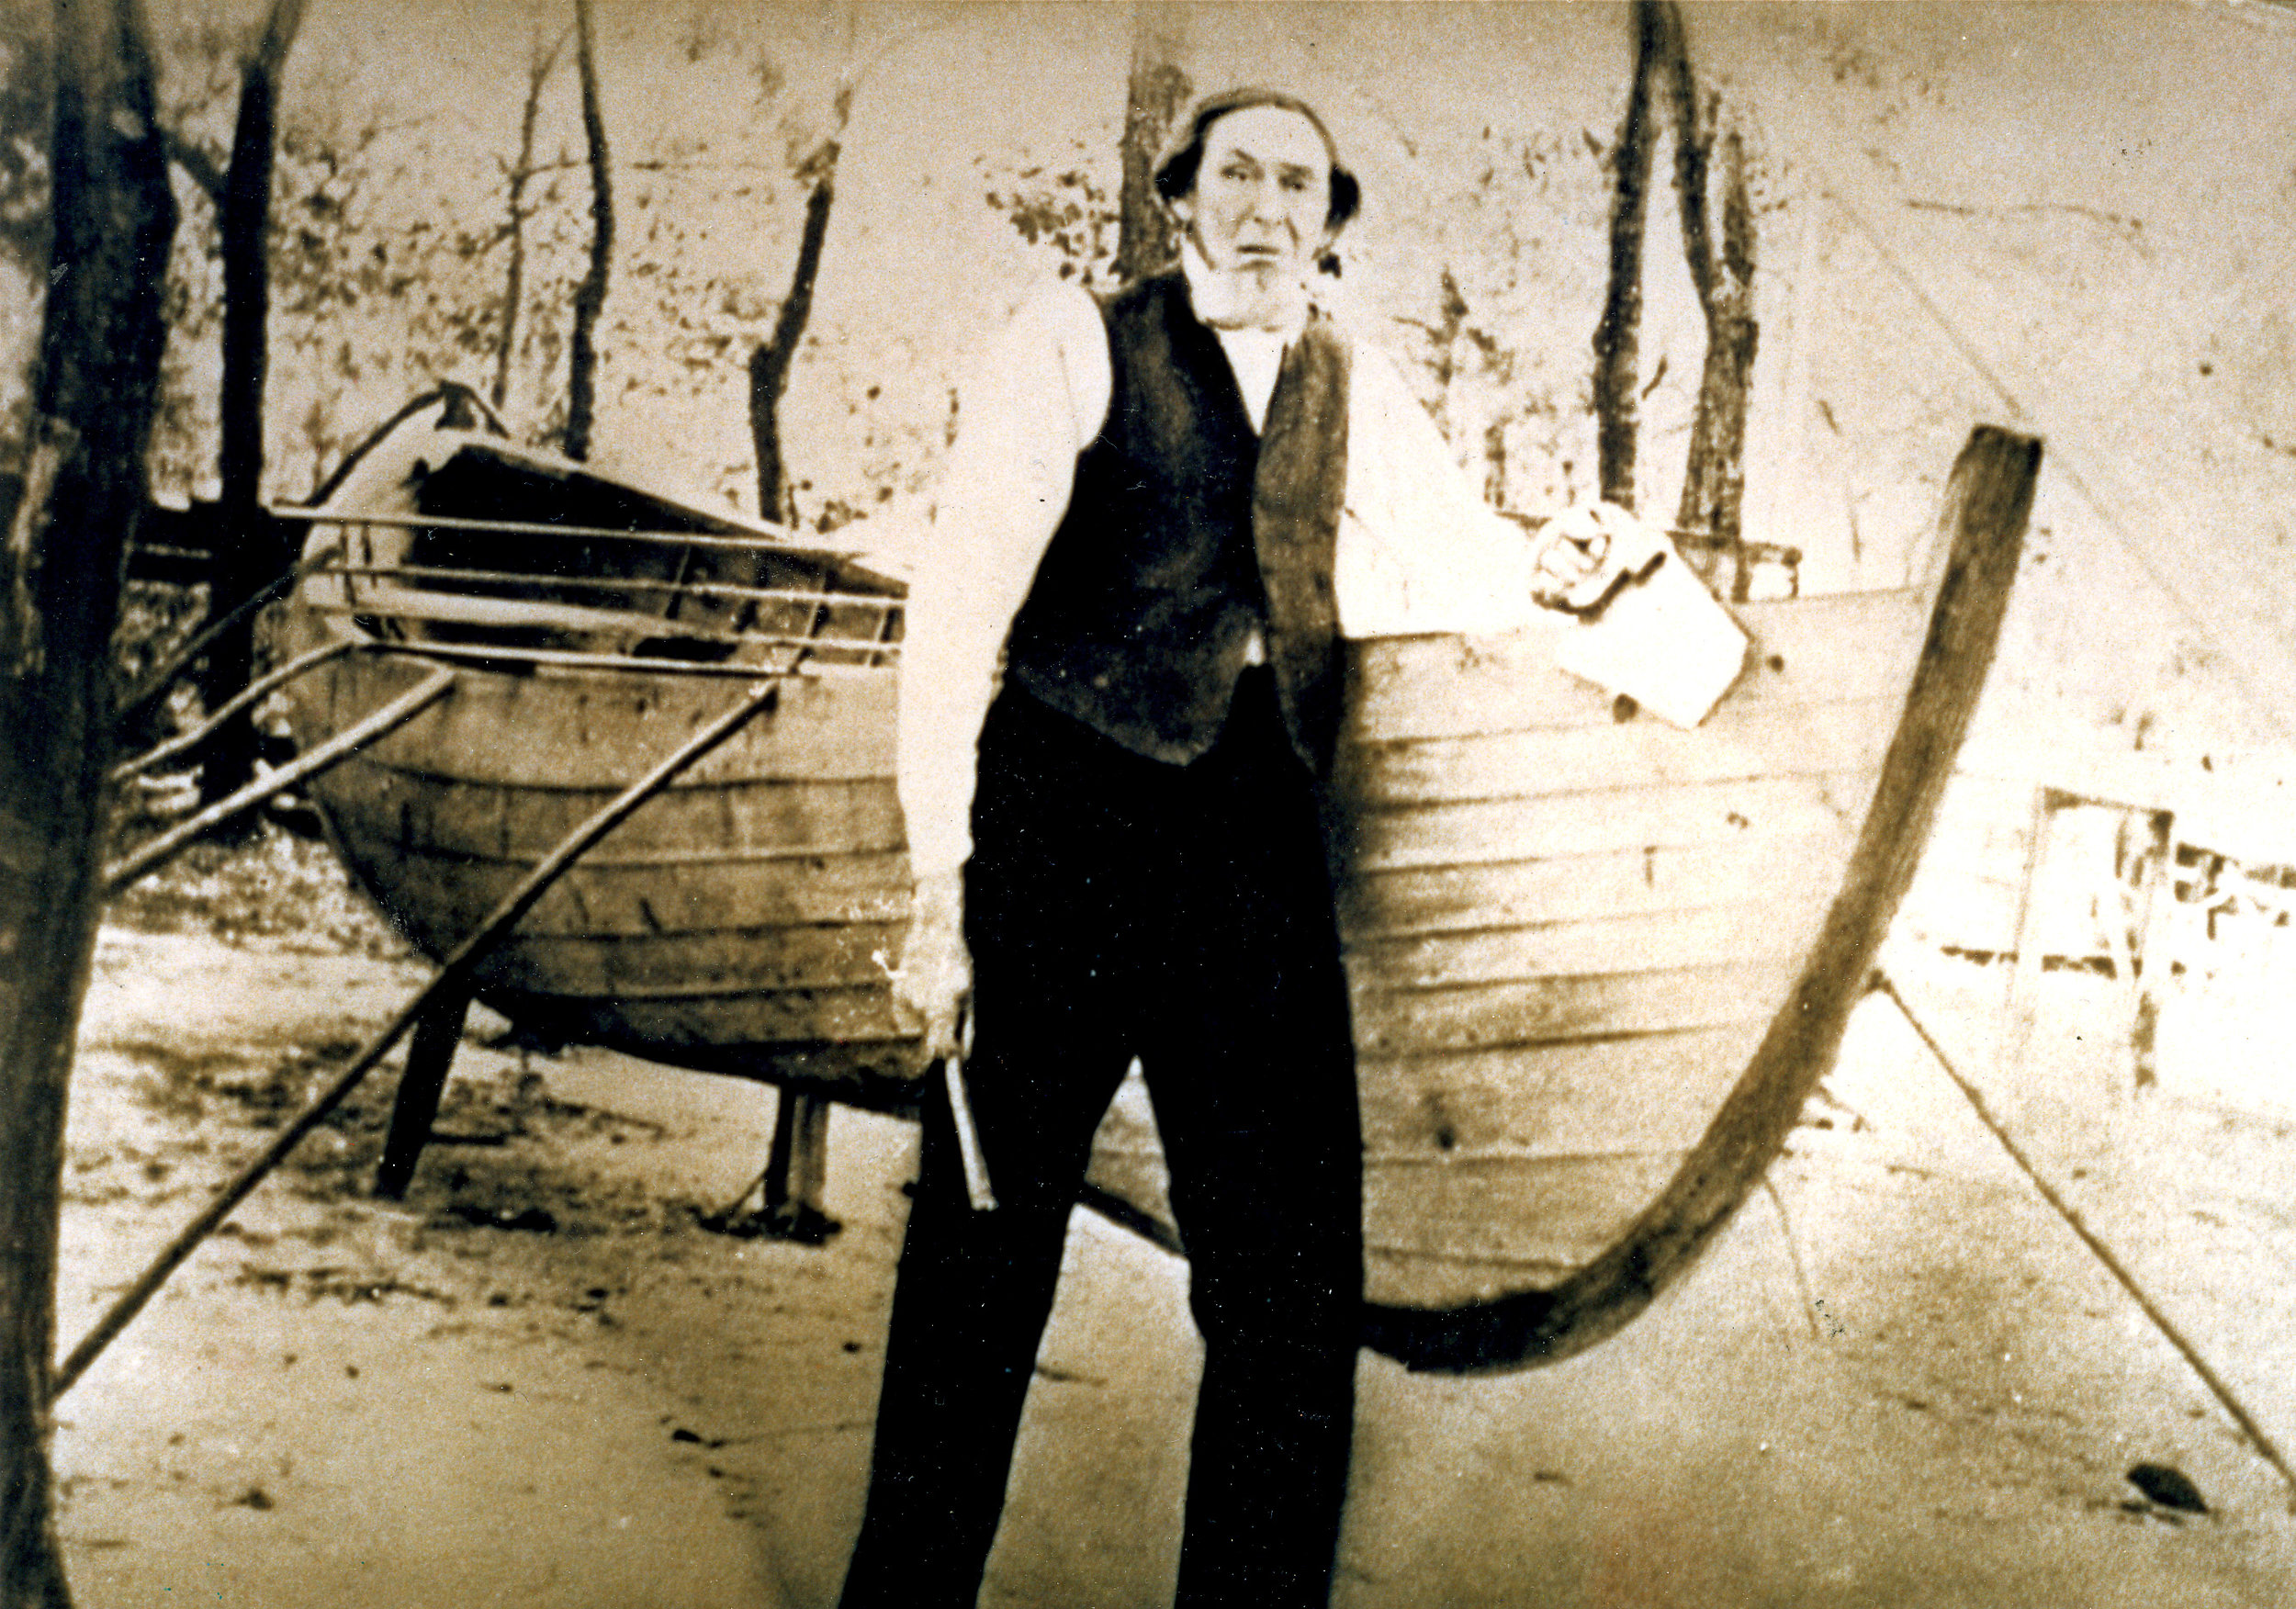 Devine Guthrie, Diamond City whaler, boatbuilder & preacher